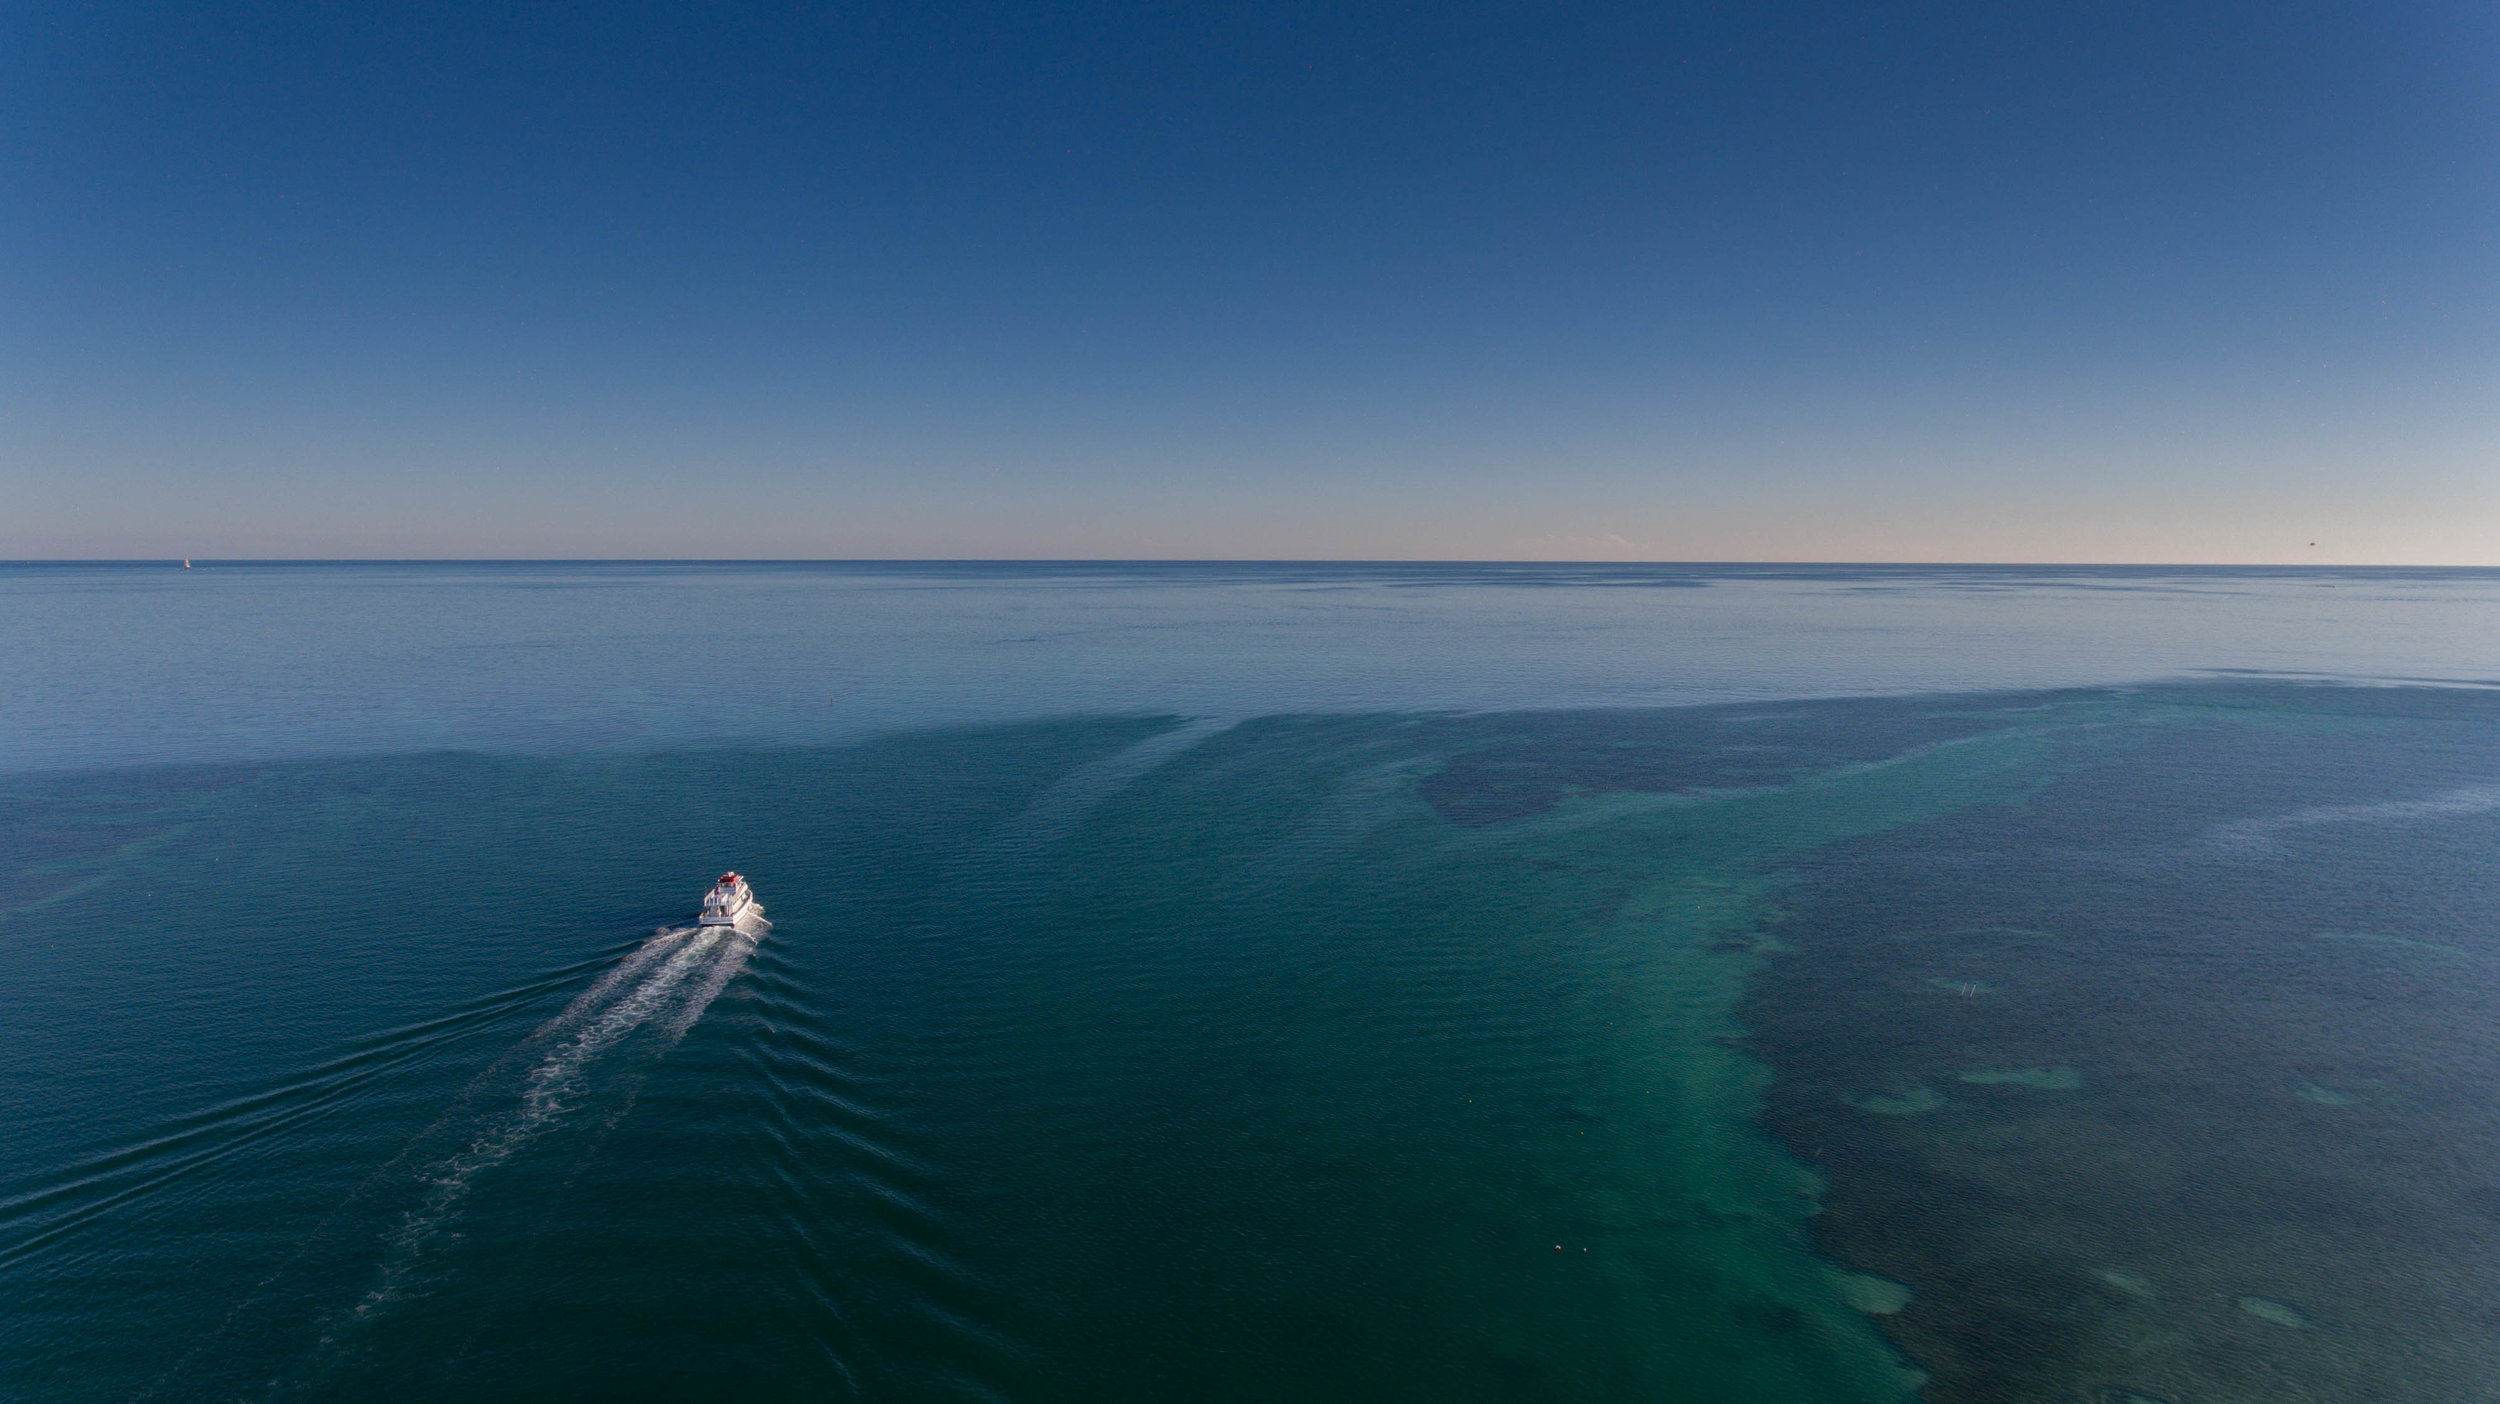 FLORIDA credit: DAVID GROSS / coral reef image bank